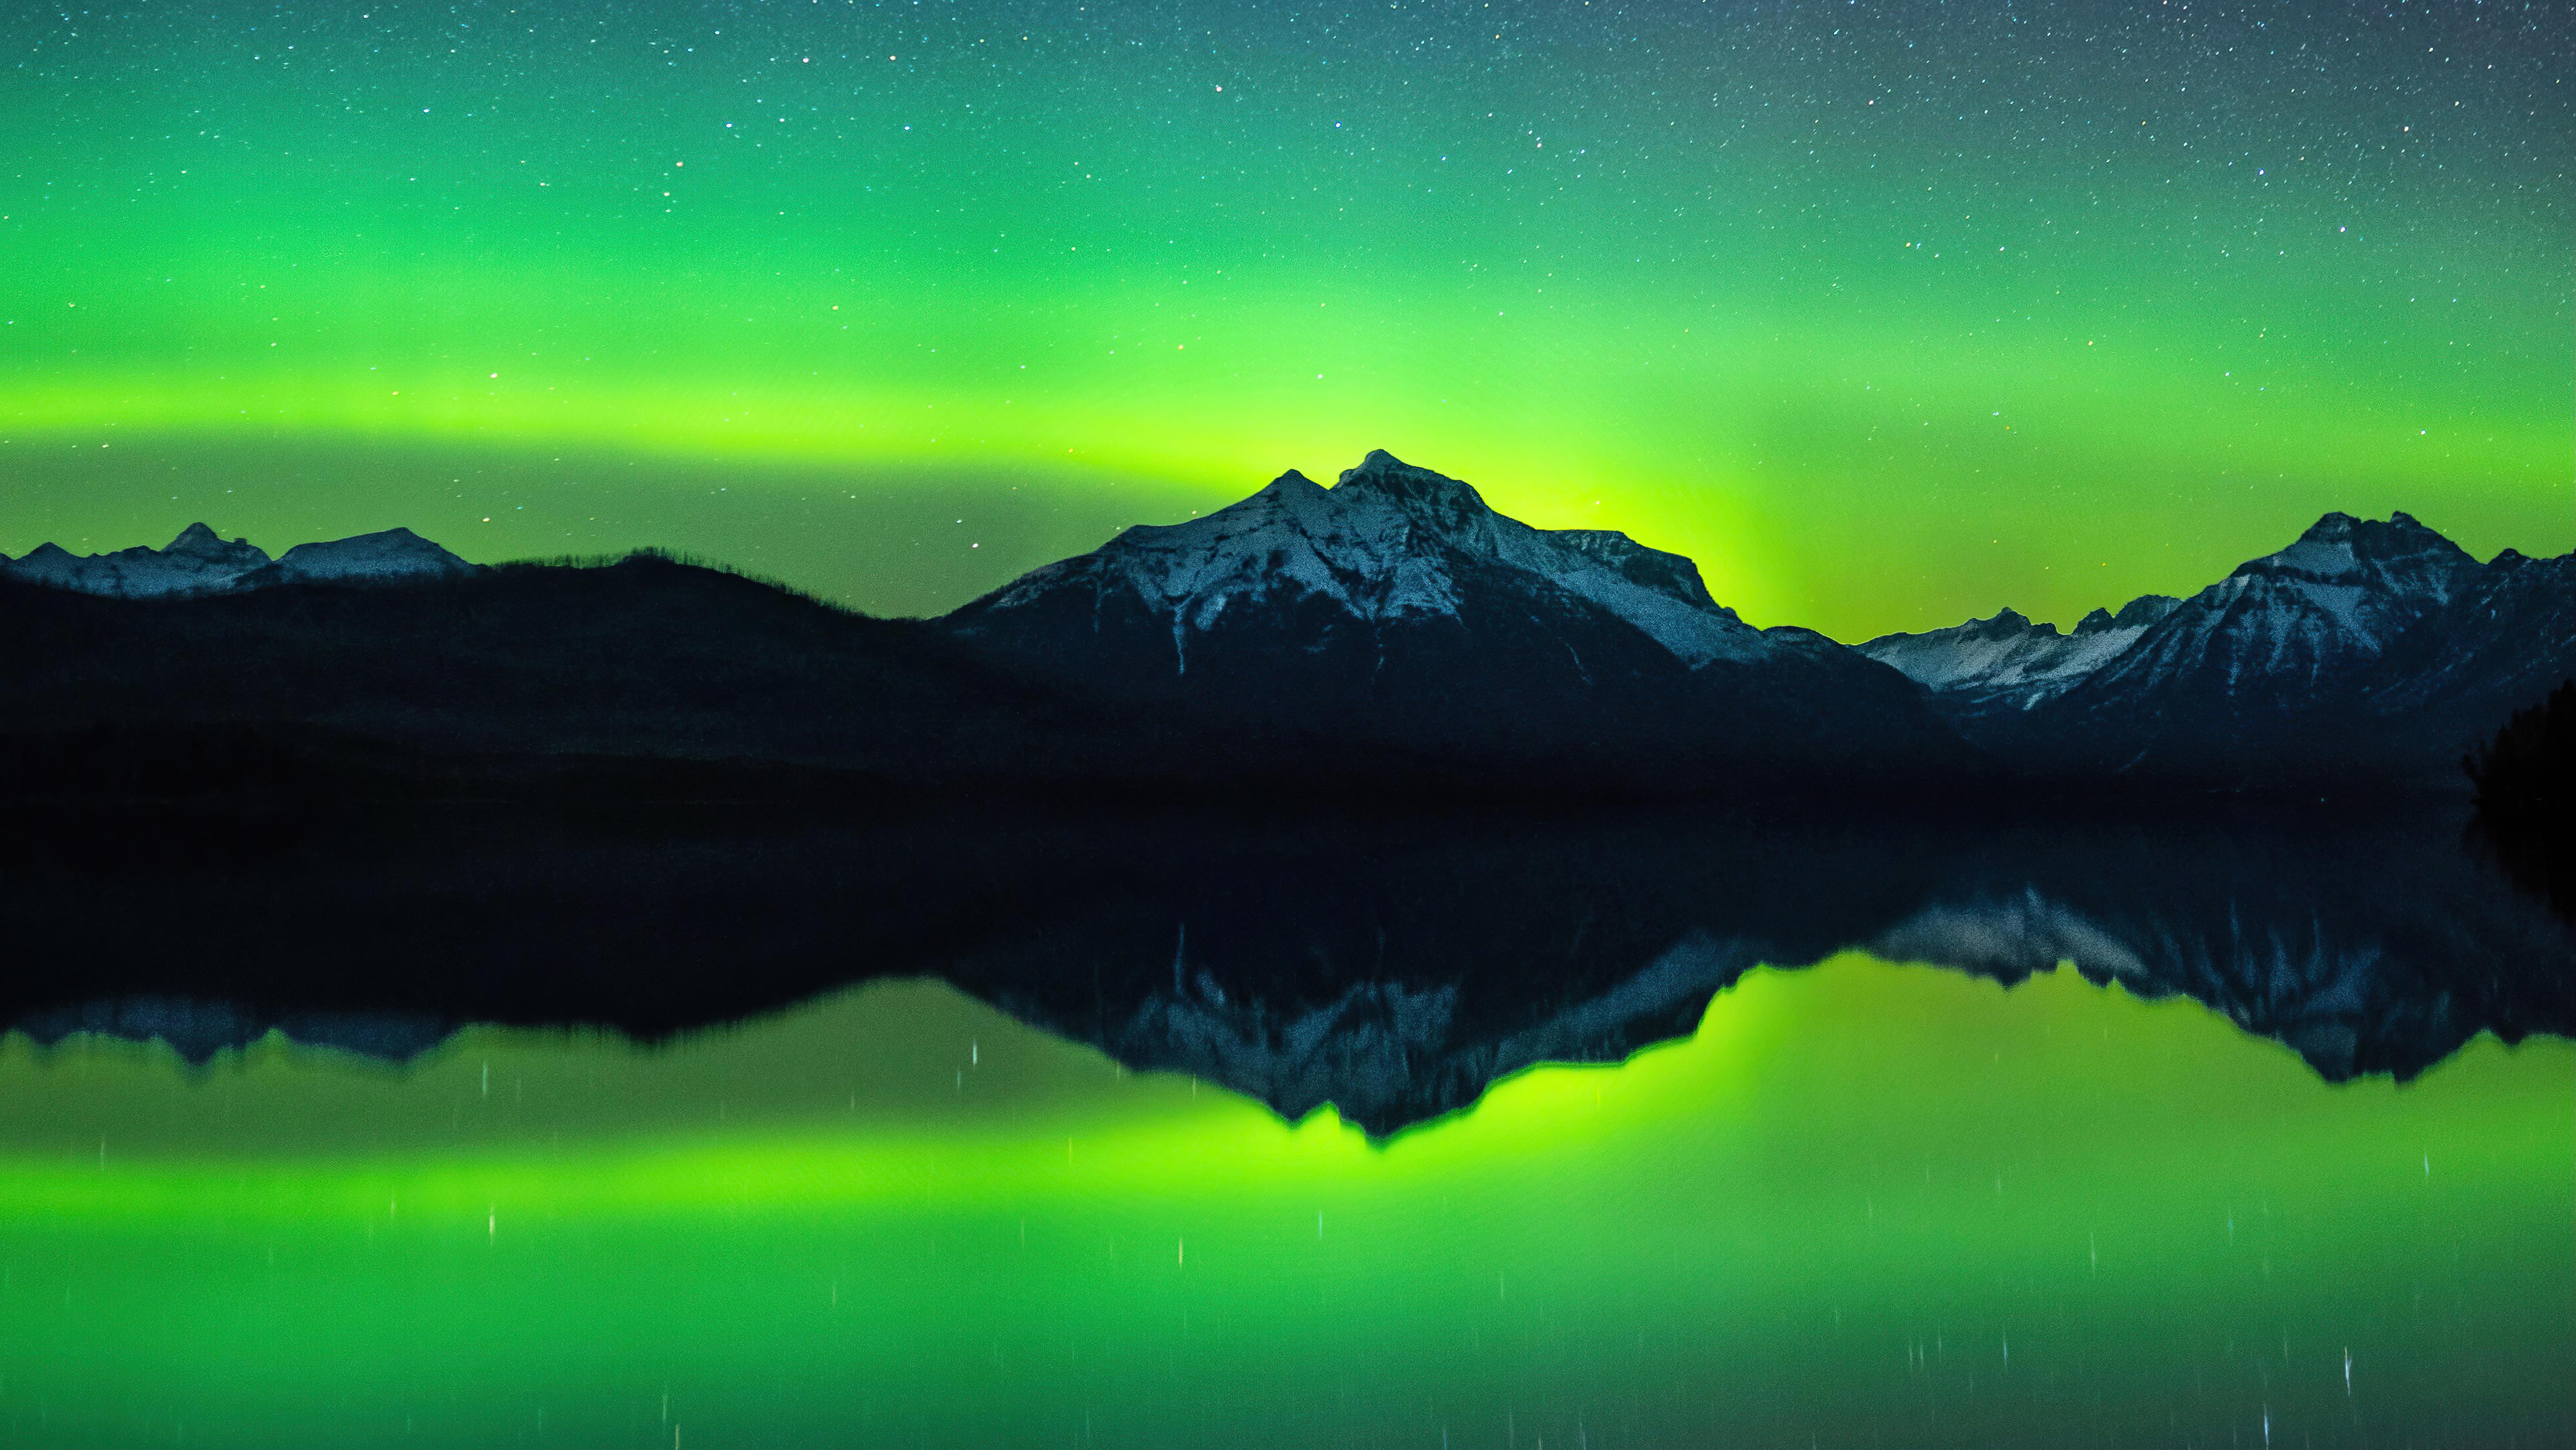 Wallpaper Mountains under green sky